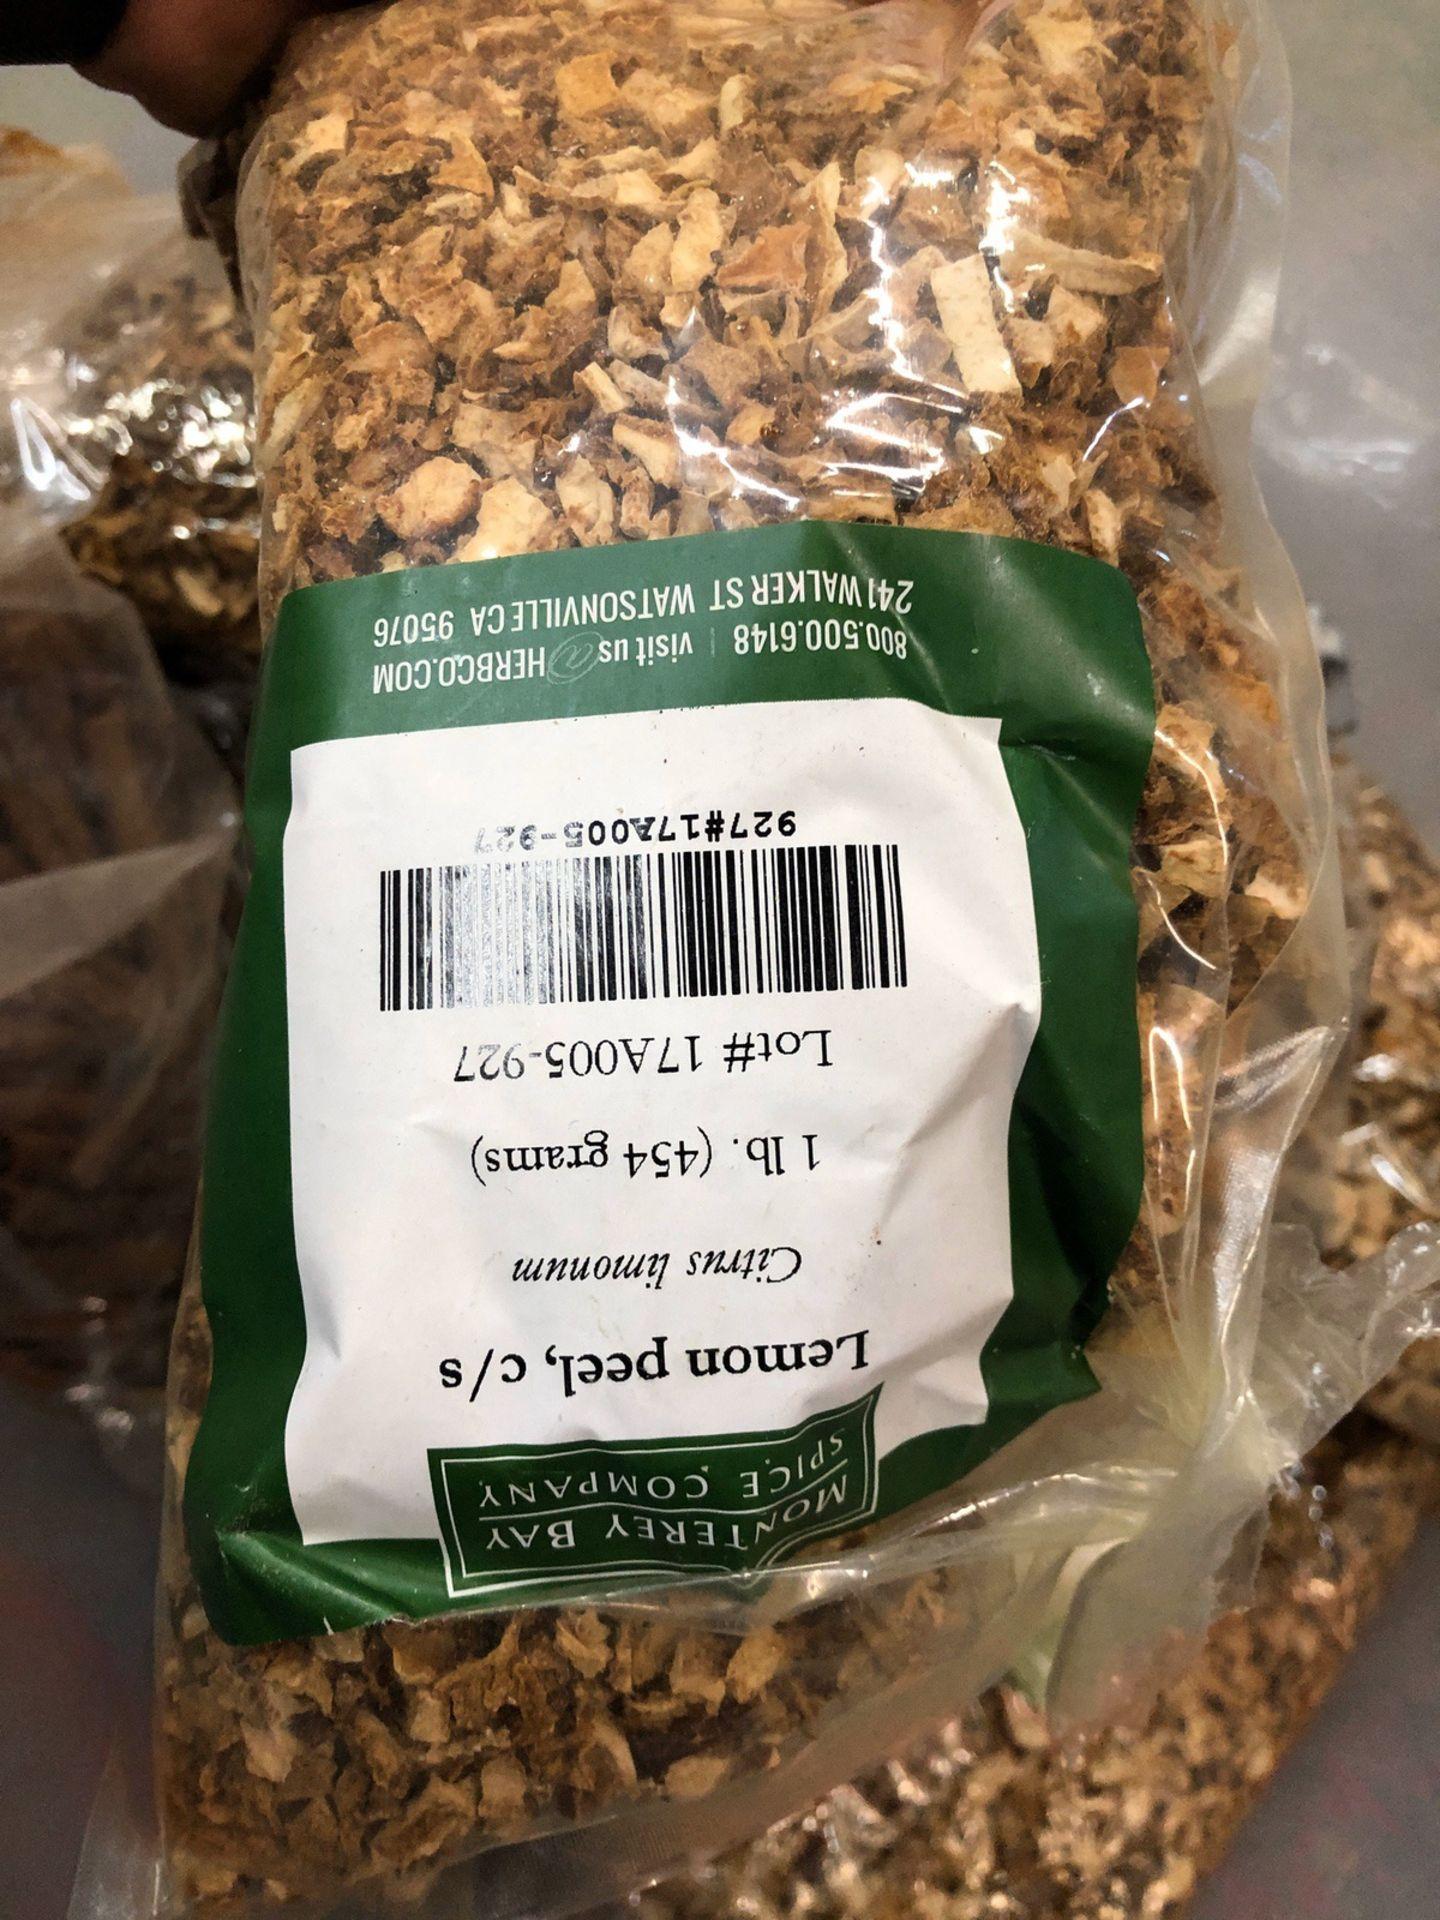 Lot 110 - Lot of Herbs and Botanicals: Lemon Peel, Juniper Berries, Orange Peel, Orris Ro | Rig Fee: $20 or HC